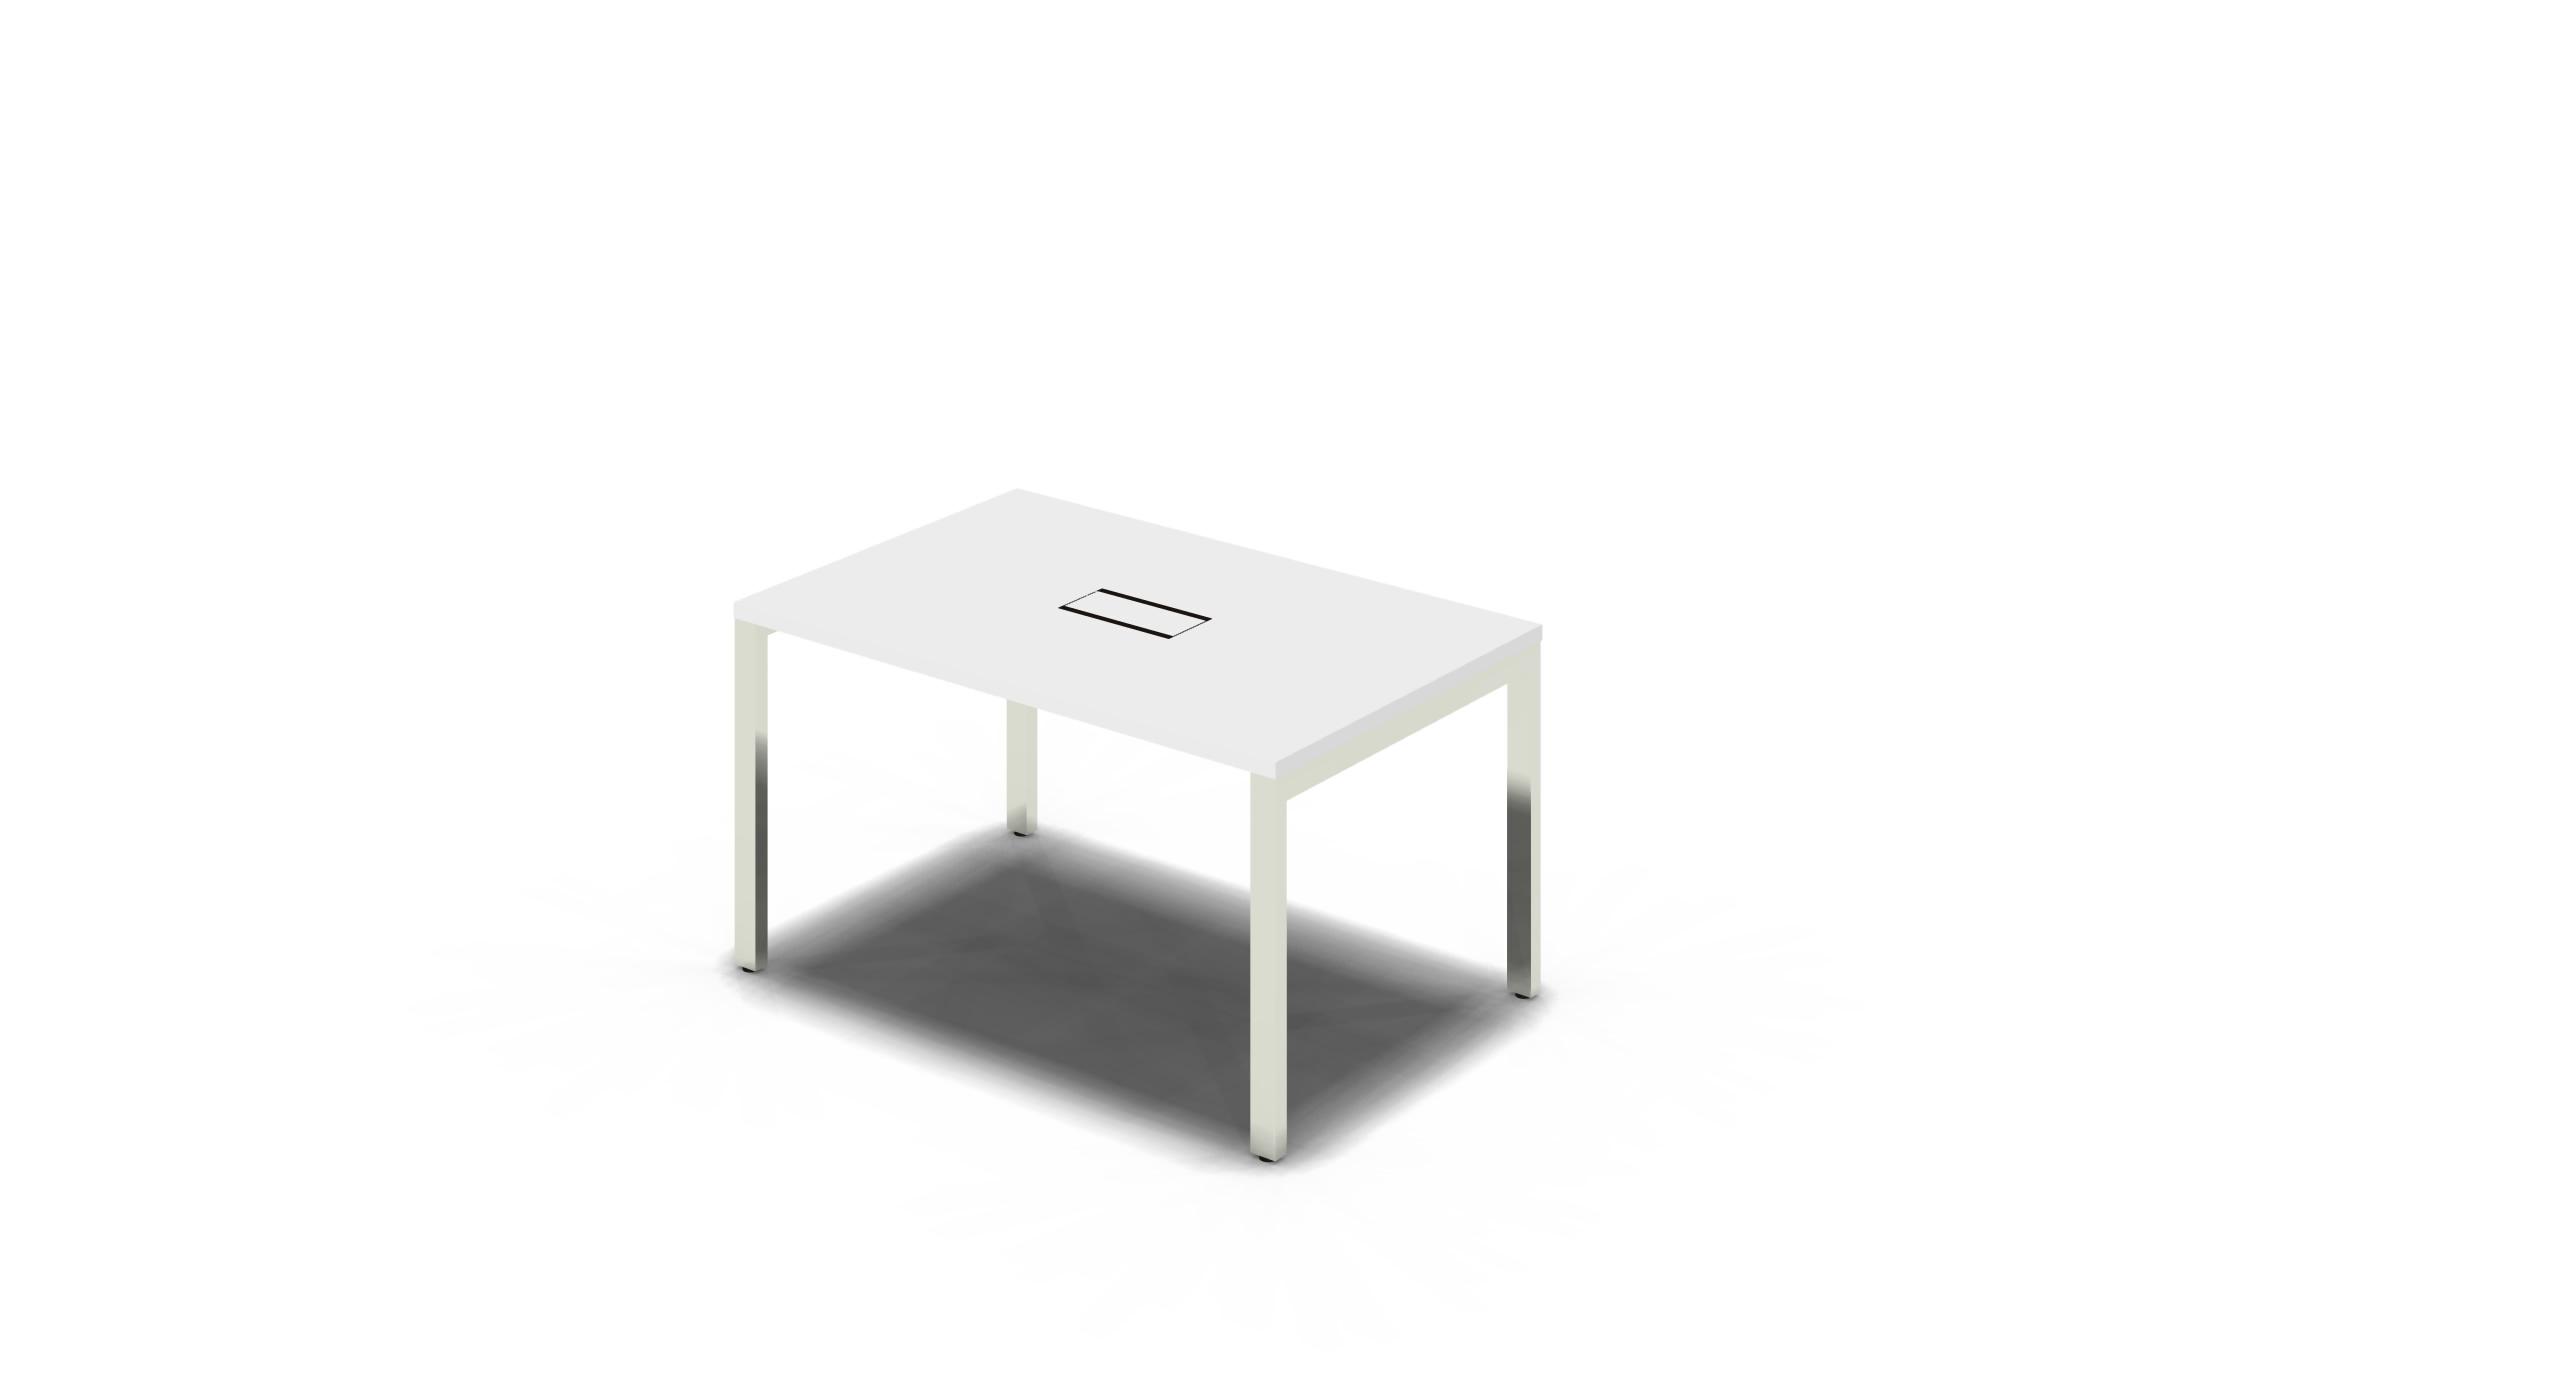 Table_Square_1200x750_Chrome_White_withOption